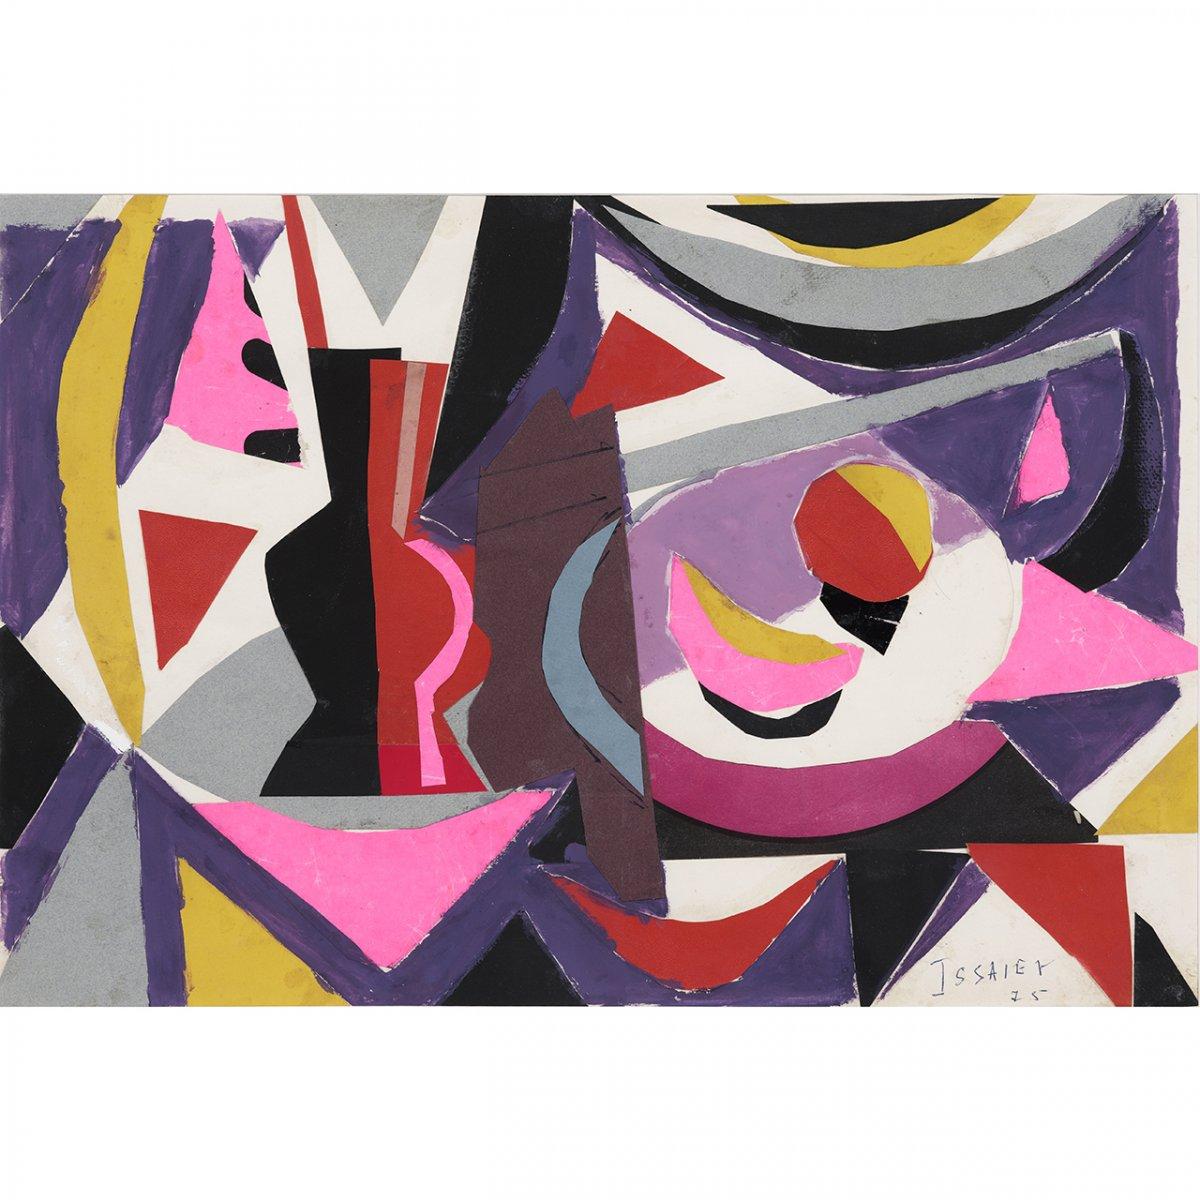 Nicolas IssaÏev (1891-1977). Collage russe. Hommage à André Lanskoy (1975)